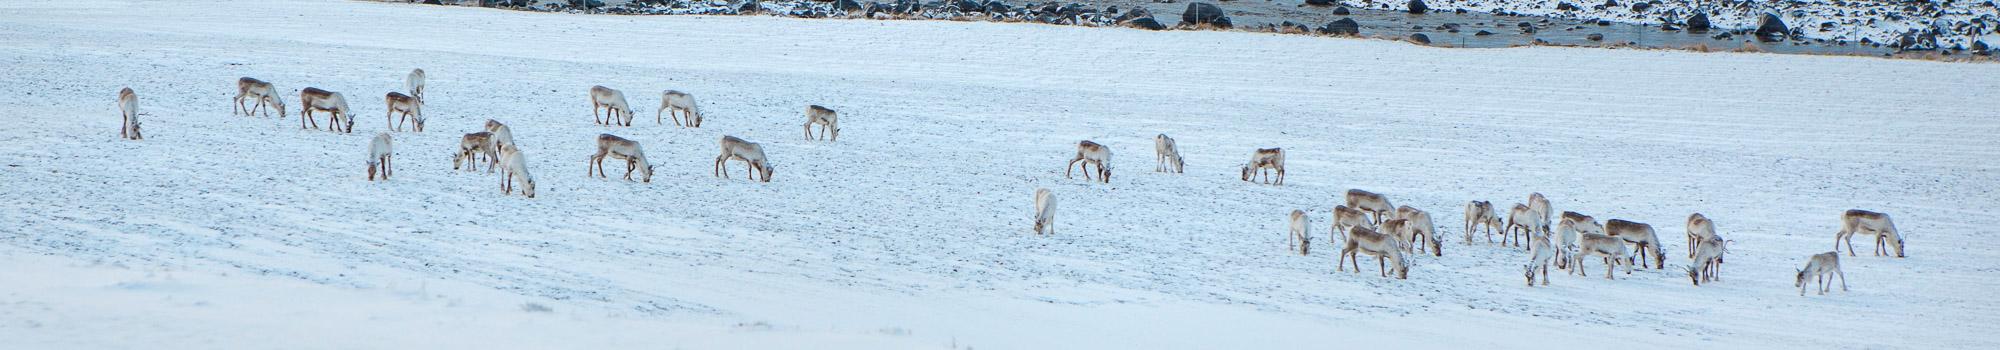 Group of Reindeer in winter